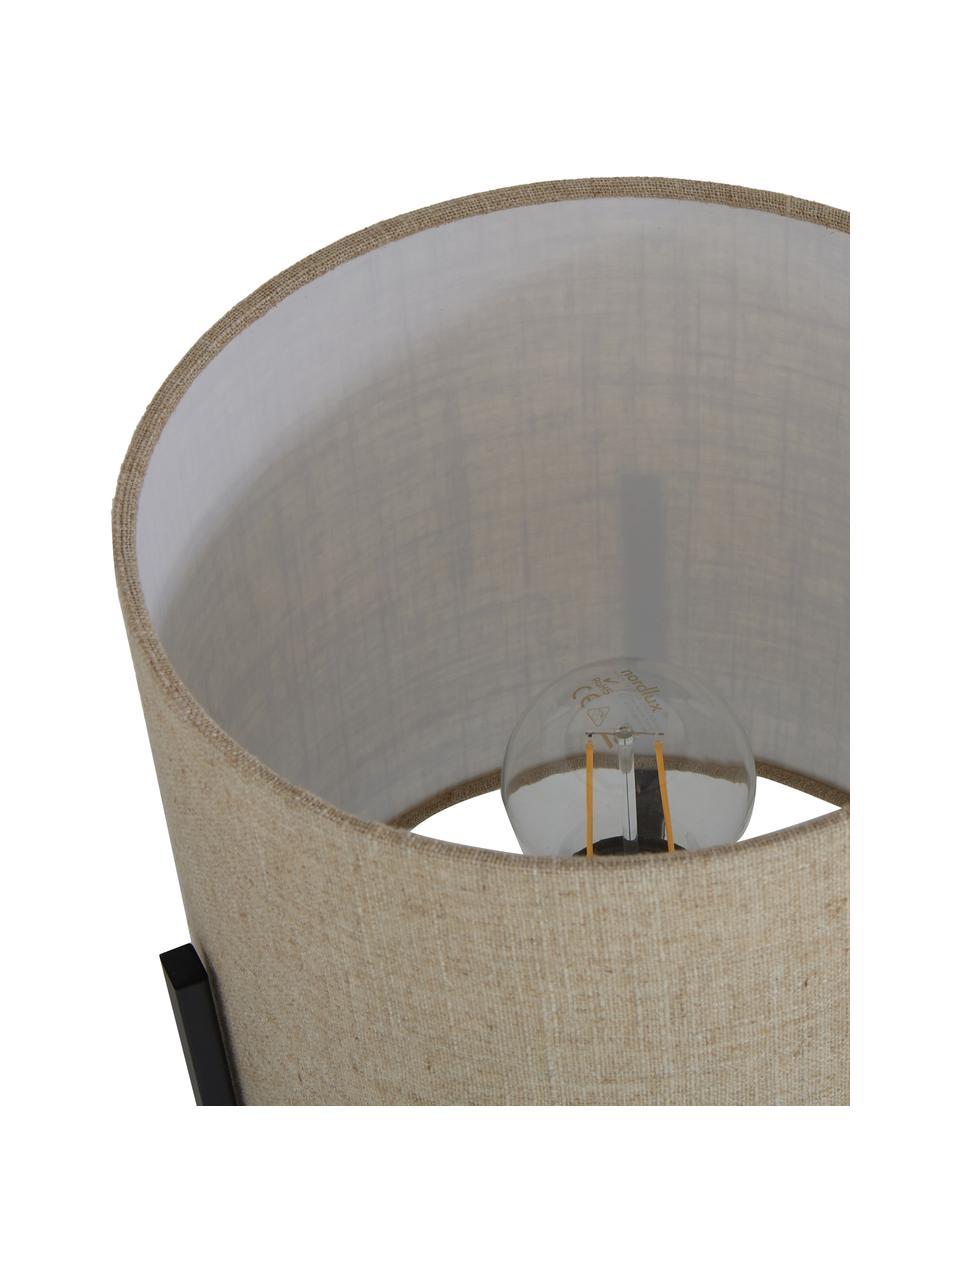 Tischlampe Piper aus Leinen, Lampenschirm: 85% Leinen, 15% Terylen, Lampenfuß: Metall, pulverbeschichtet, Beige, Ø 22 x H 38 cm